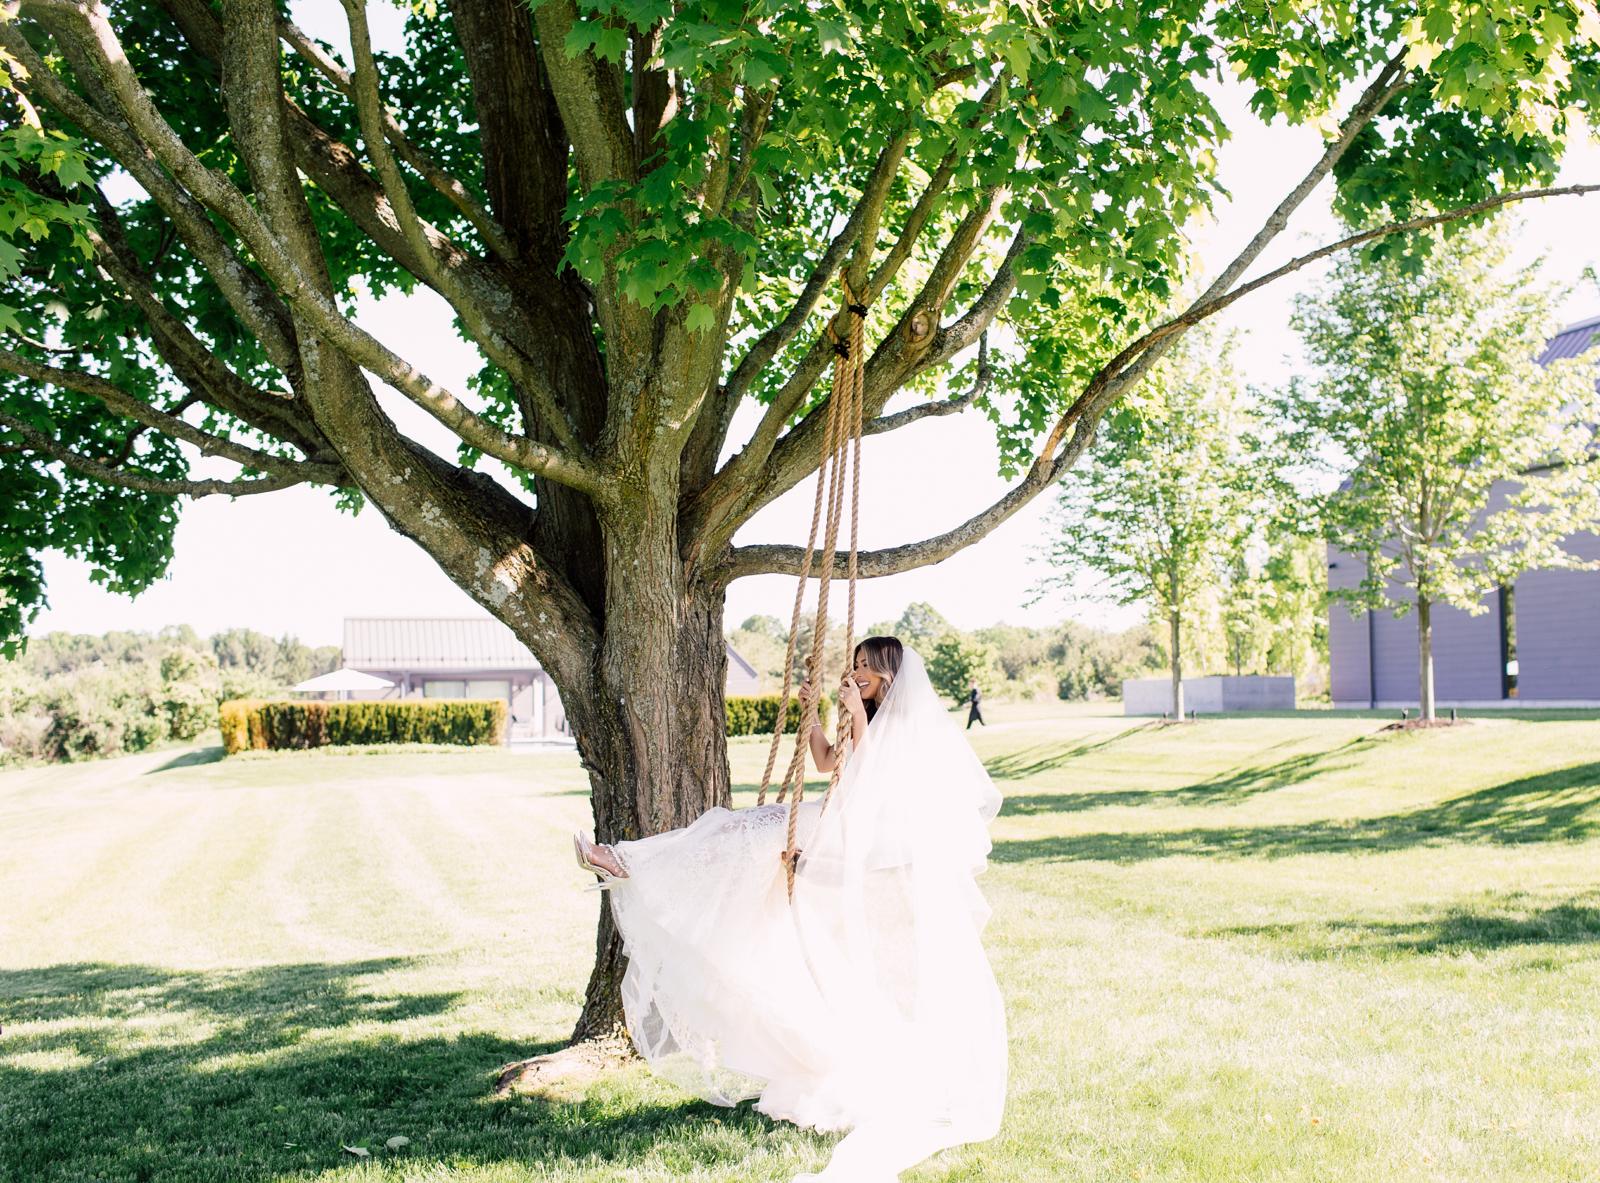 Bride swing